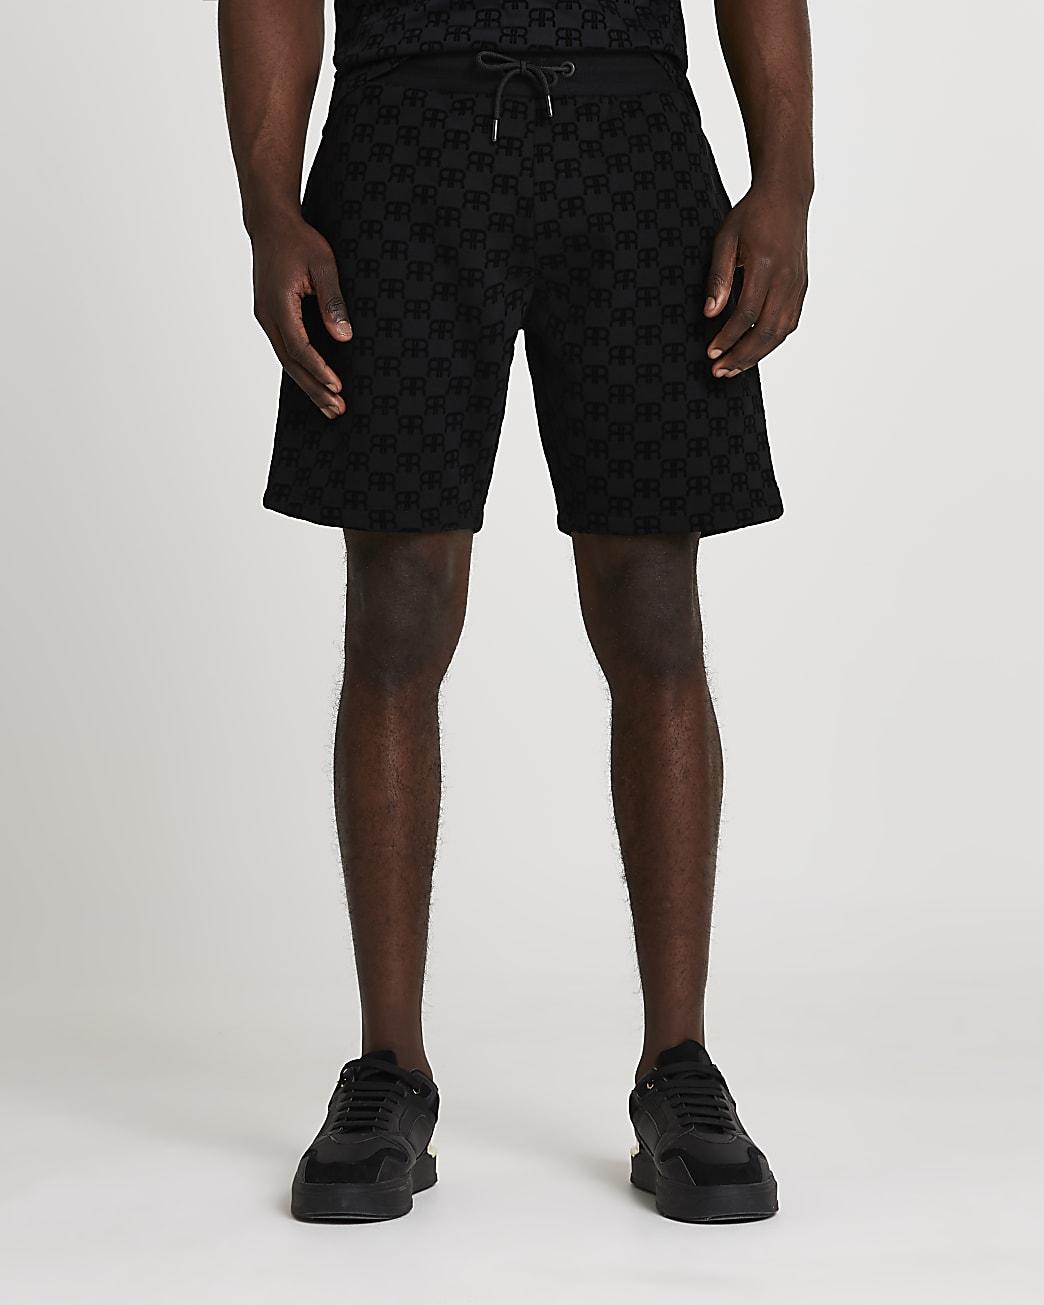 Black 'RR' Monogram print slim fit shorts